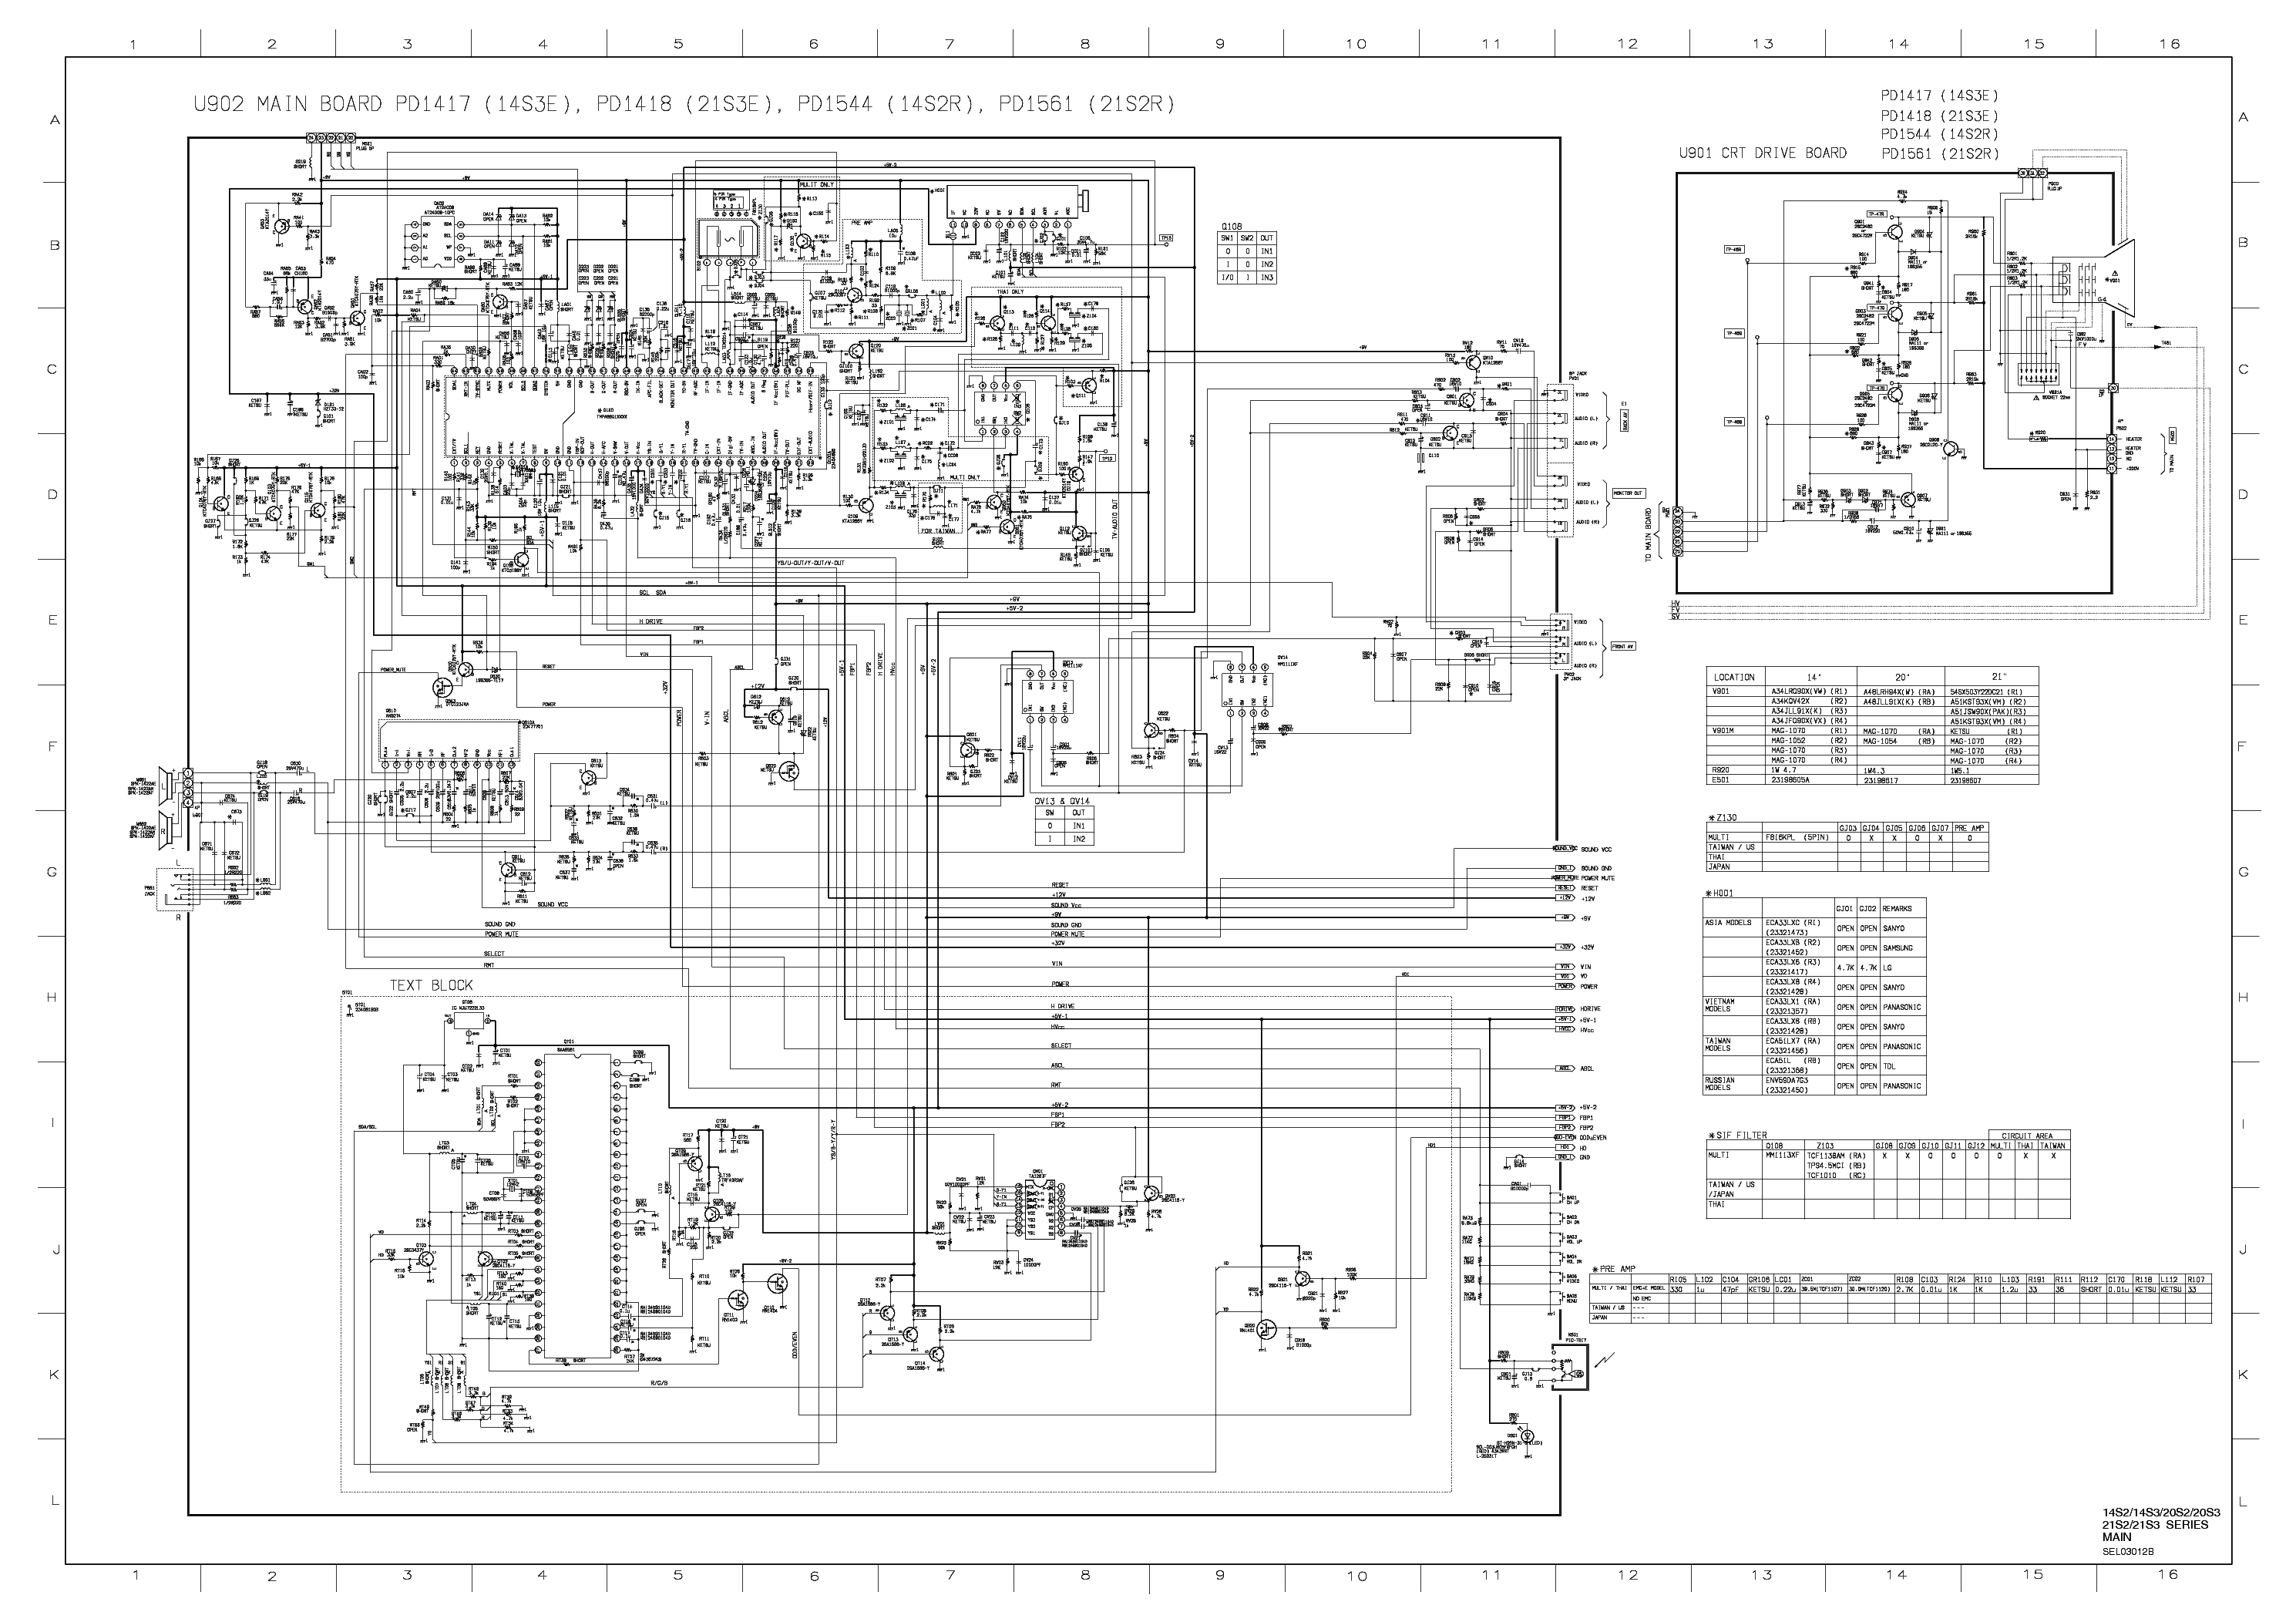 Sanyo Tv Schematic Circuit Diagram Wiring Libraries Toshiba Diagrams Simple Diagramtoshiba Crt